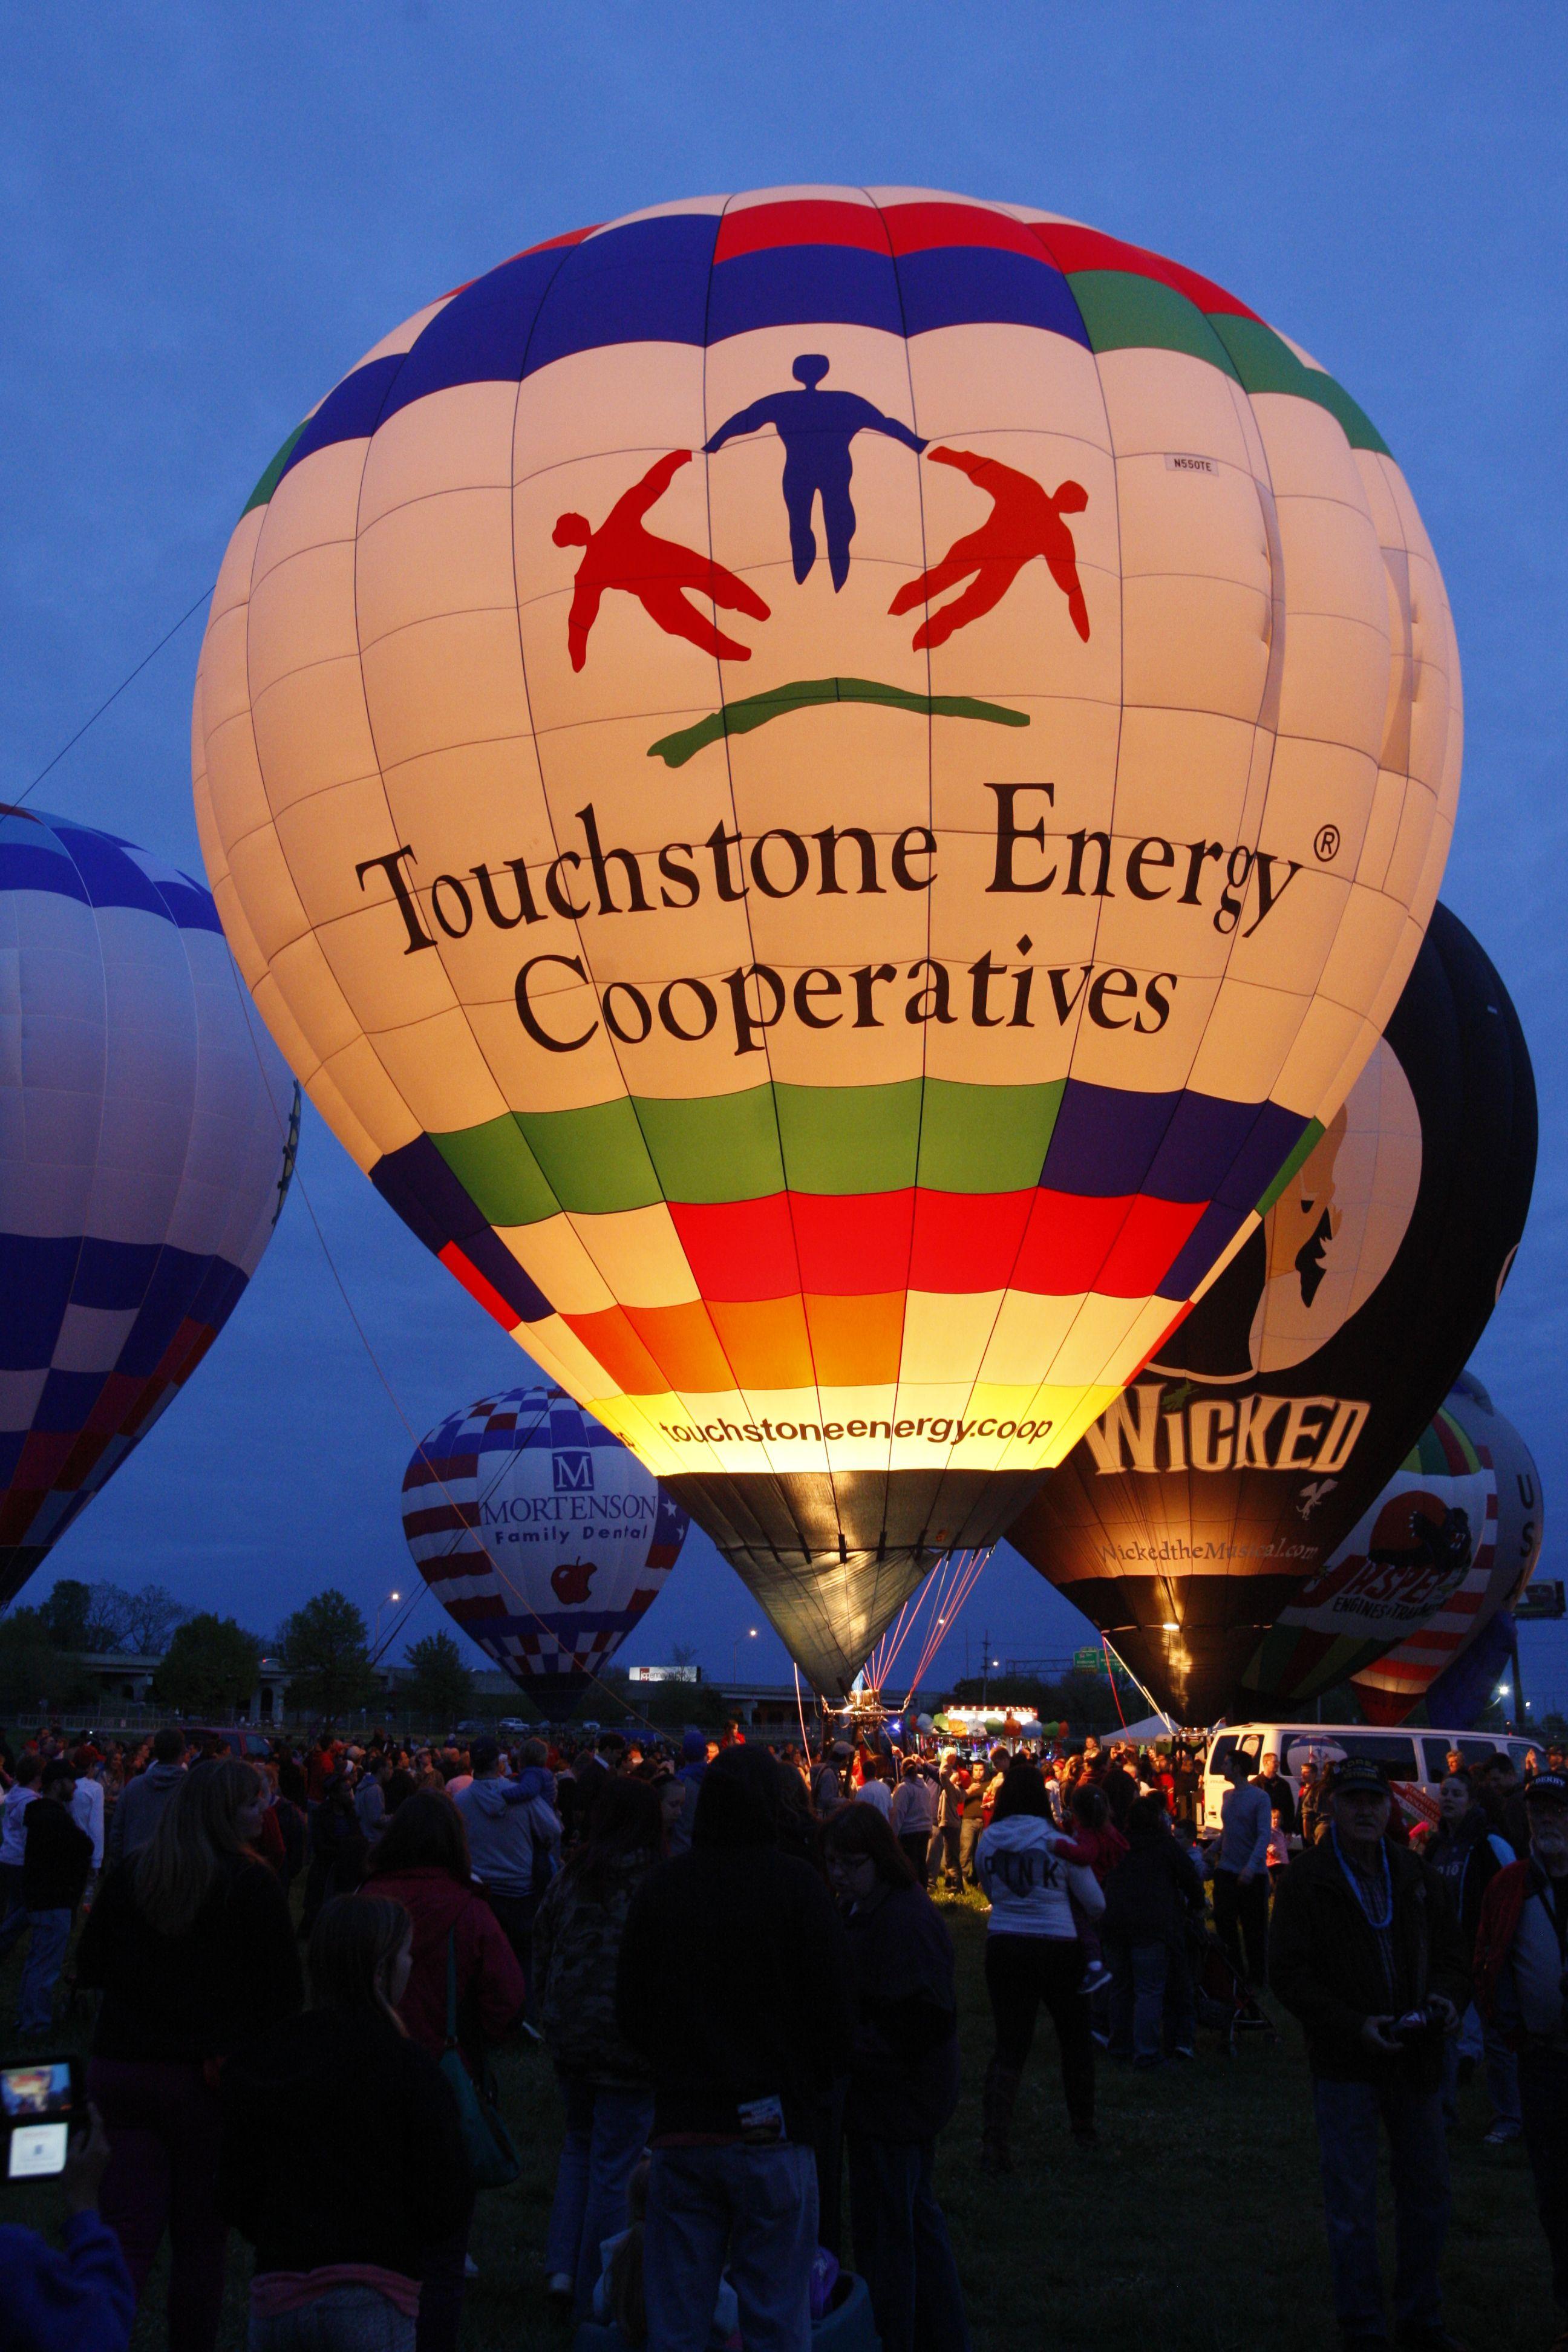 Touchstone Energy Balloon at night Hot air, Hot air